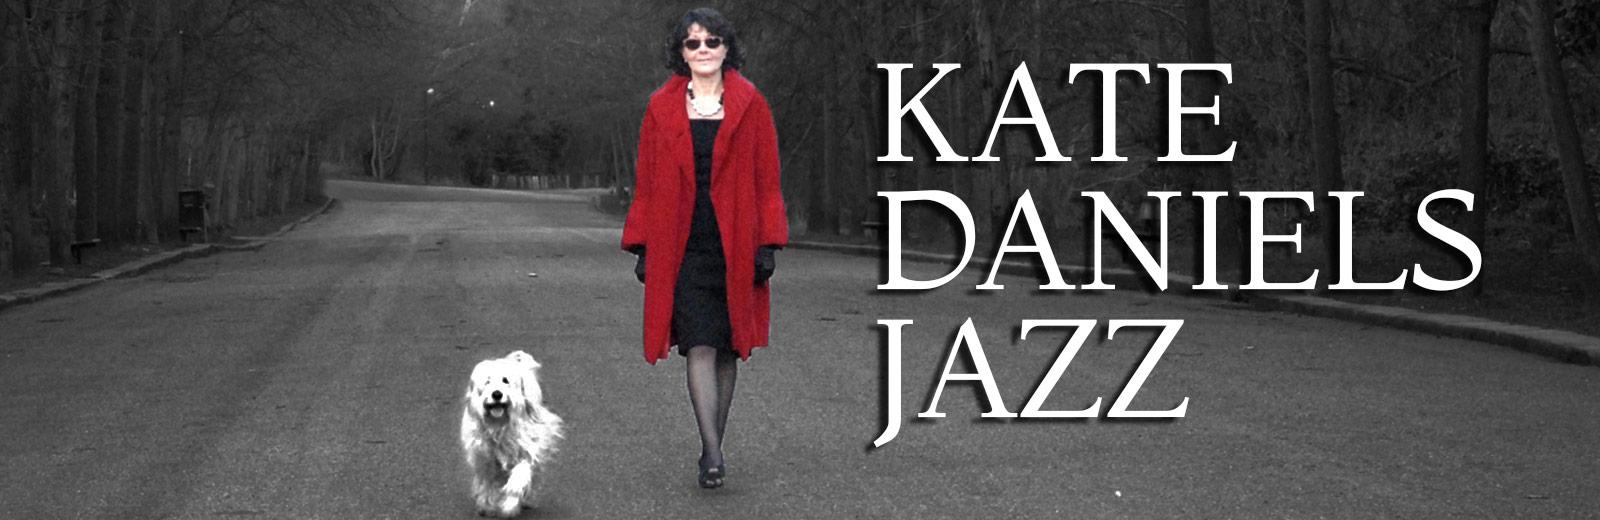 Kate Daniels Jazz